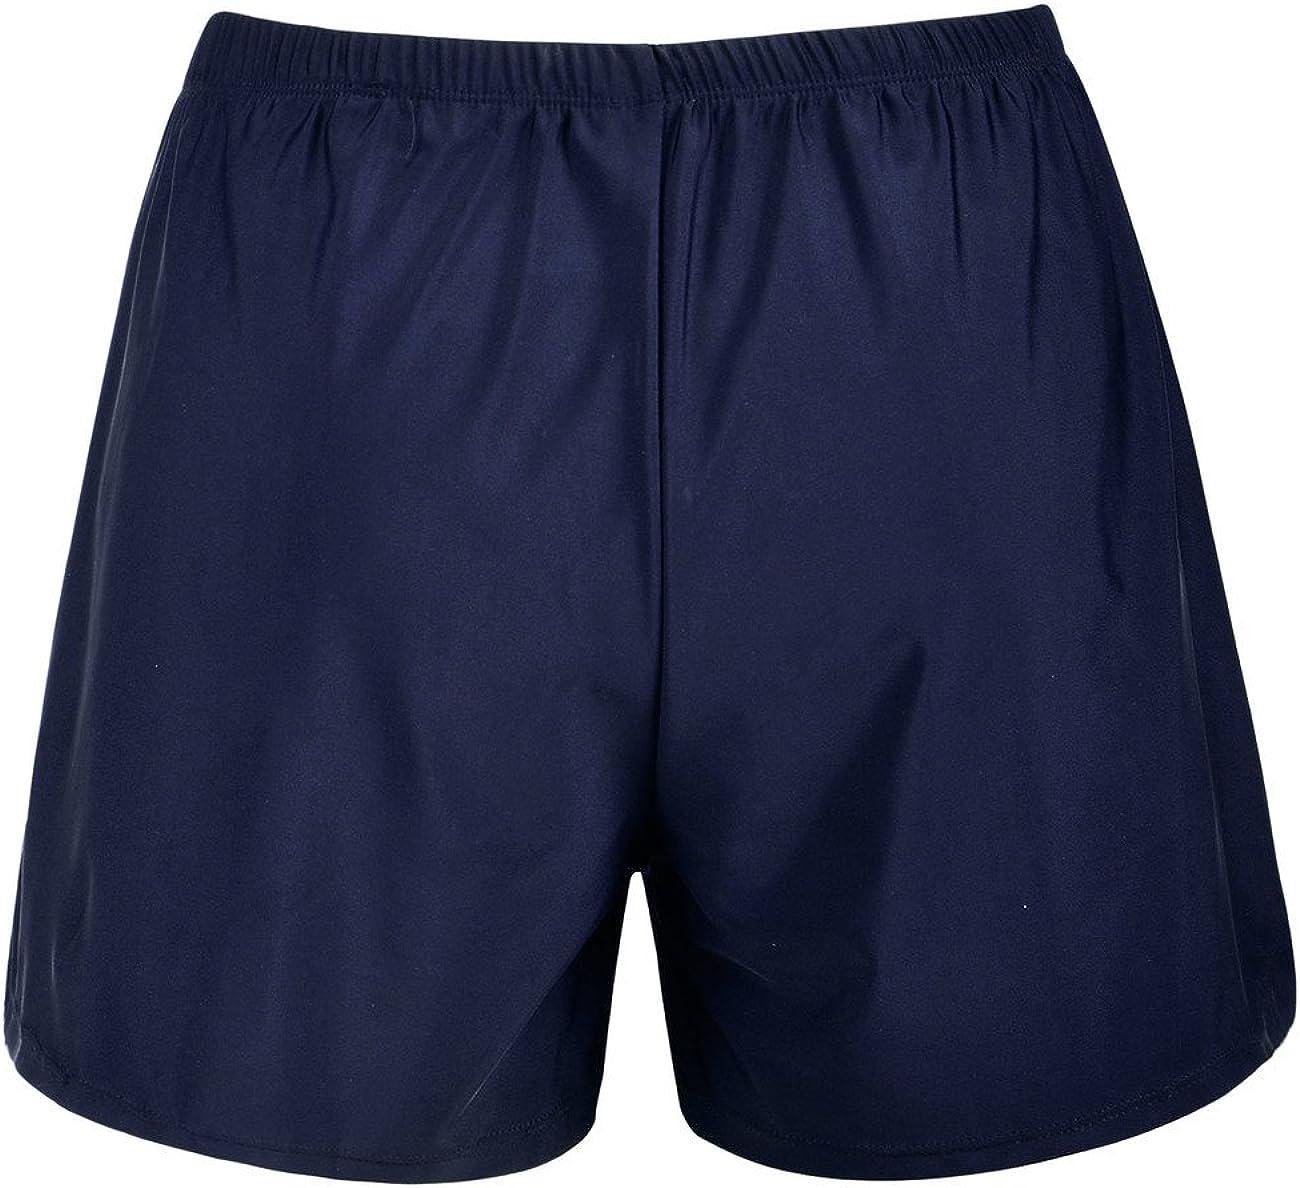 Firpearl Womens Swim Shorts Tankini Bottom Board Shorts Sport Boyleg Trunk Swimwear Bottom